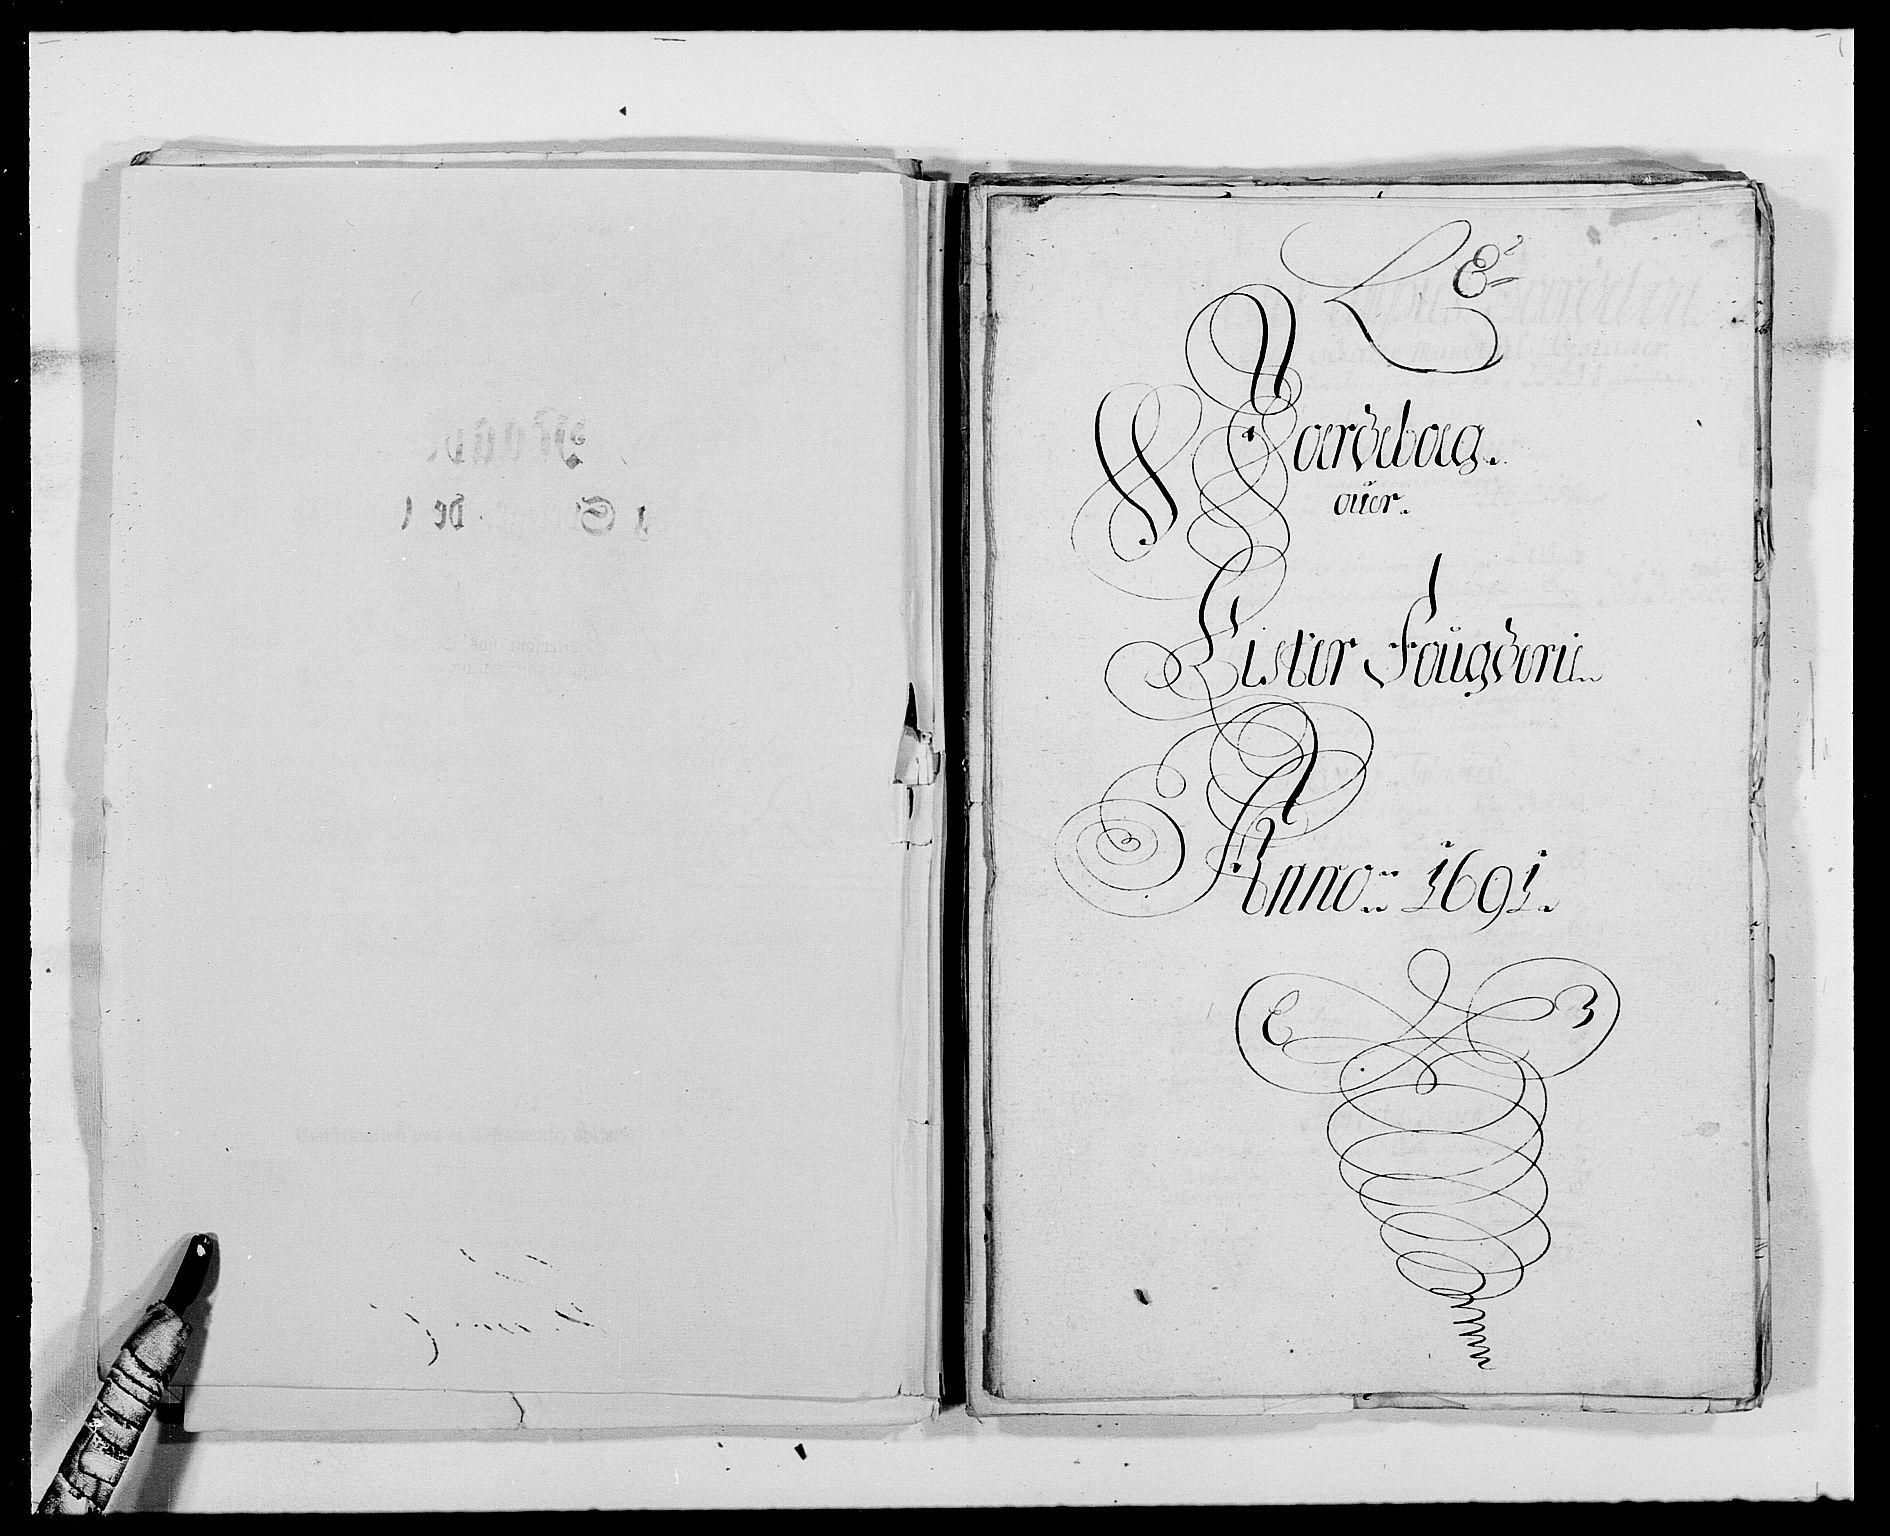 RA, Rentekammeret inntil 1814, Reviderte regnskaper, Fogderegnskap, R41/L2536: Fogderegnskap Lista, 1690-1693, s. 134